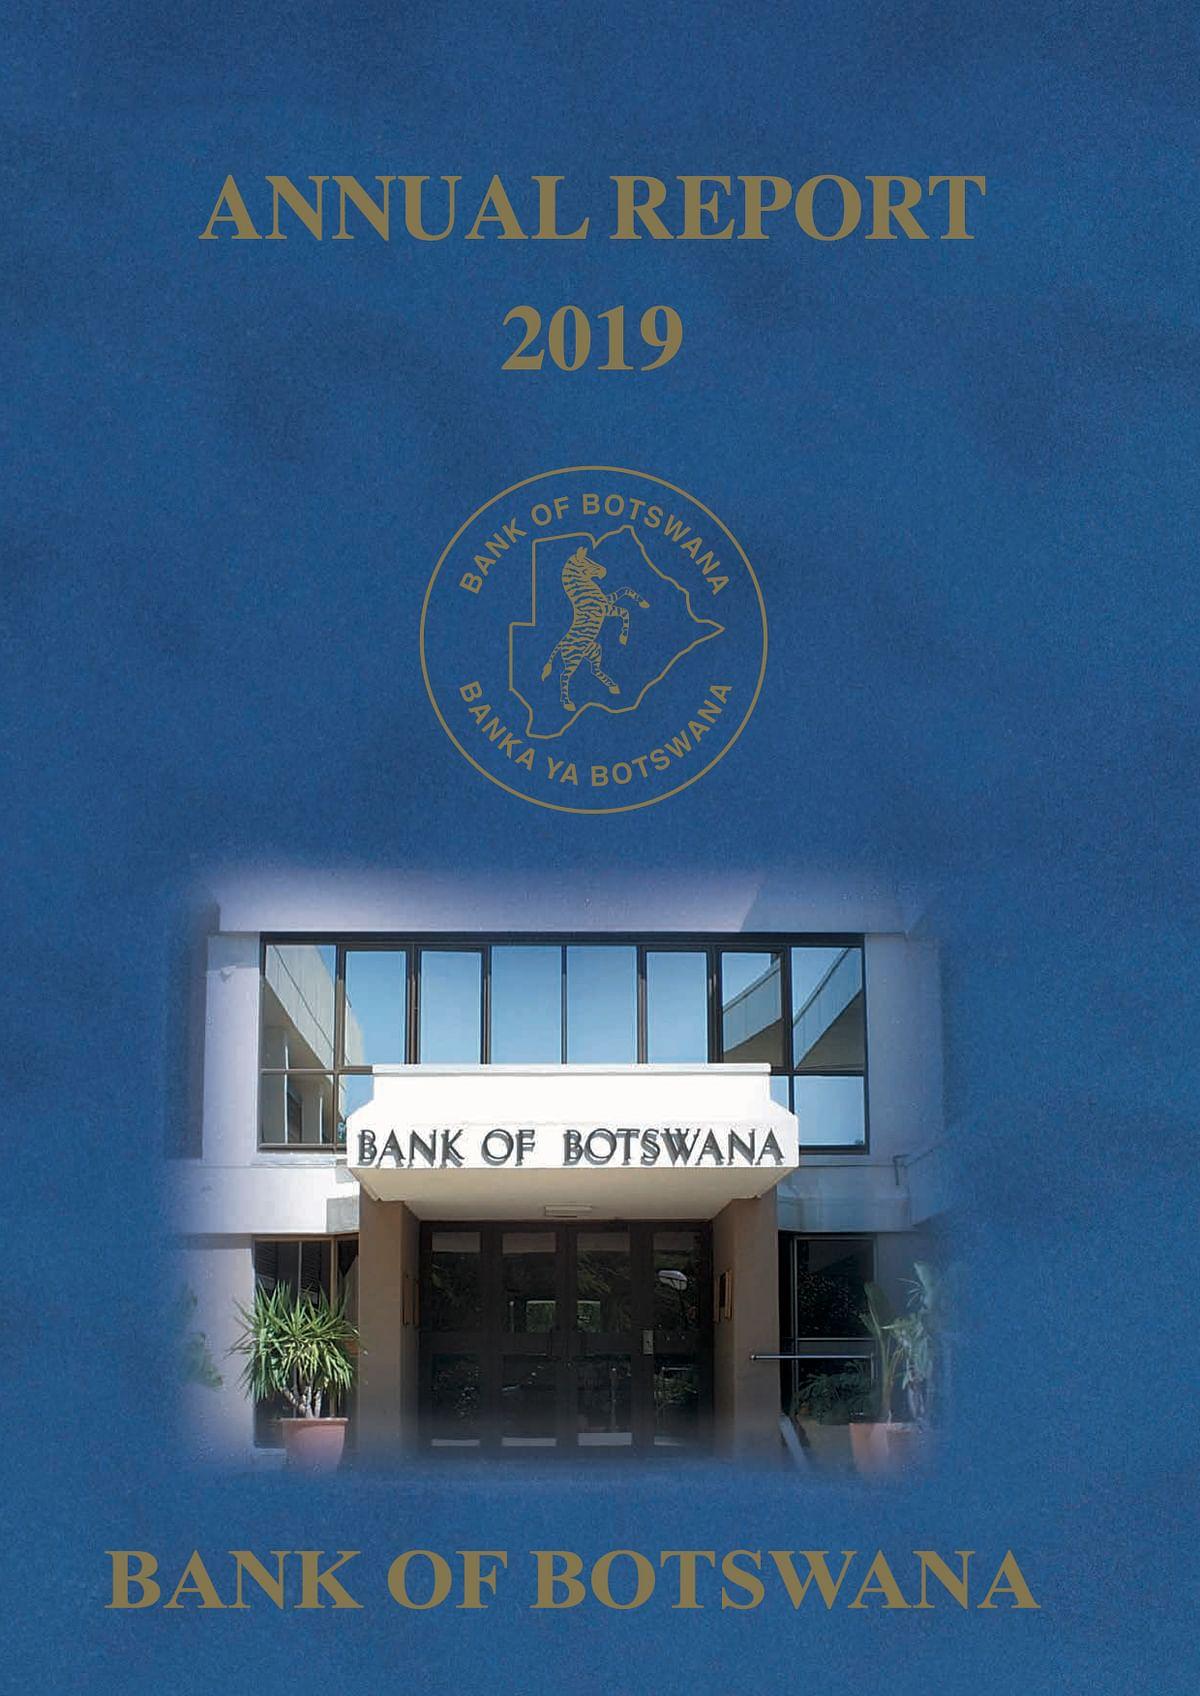 Bank of Botswana Annual Report 2019